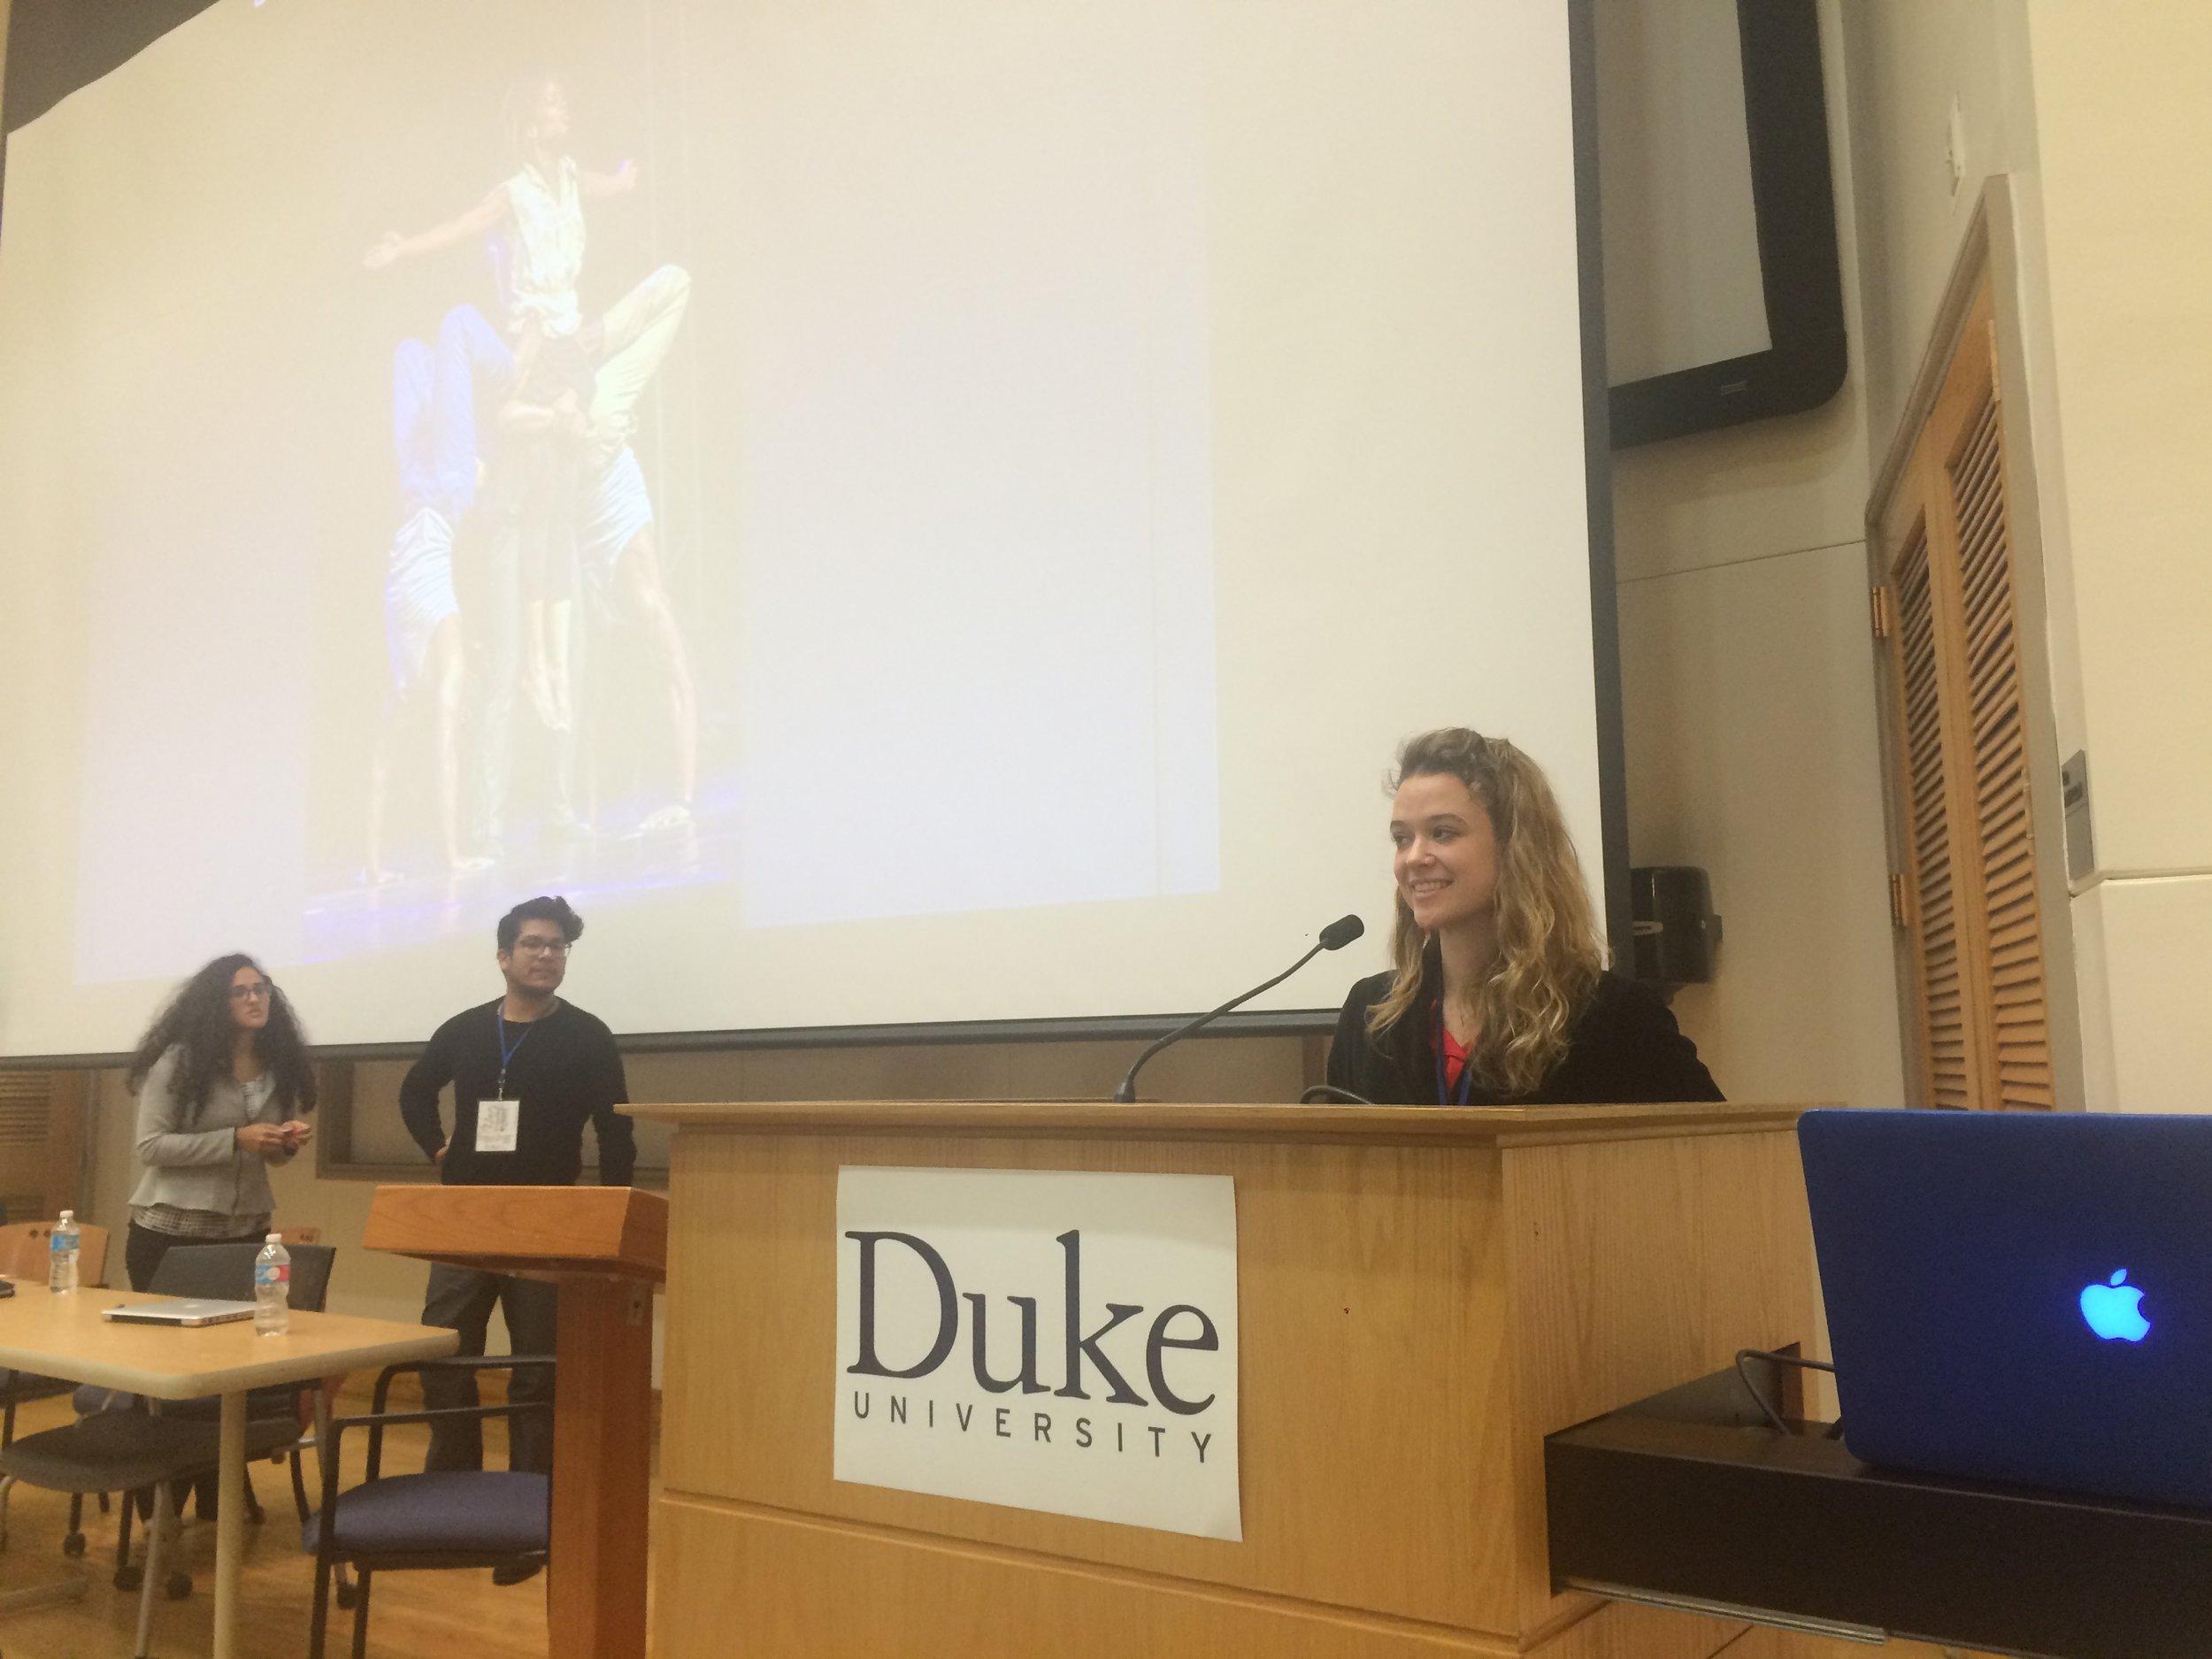 Duke University Guest Teaching